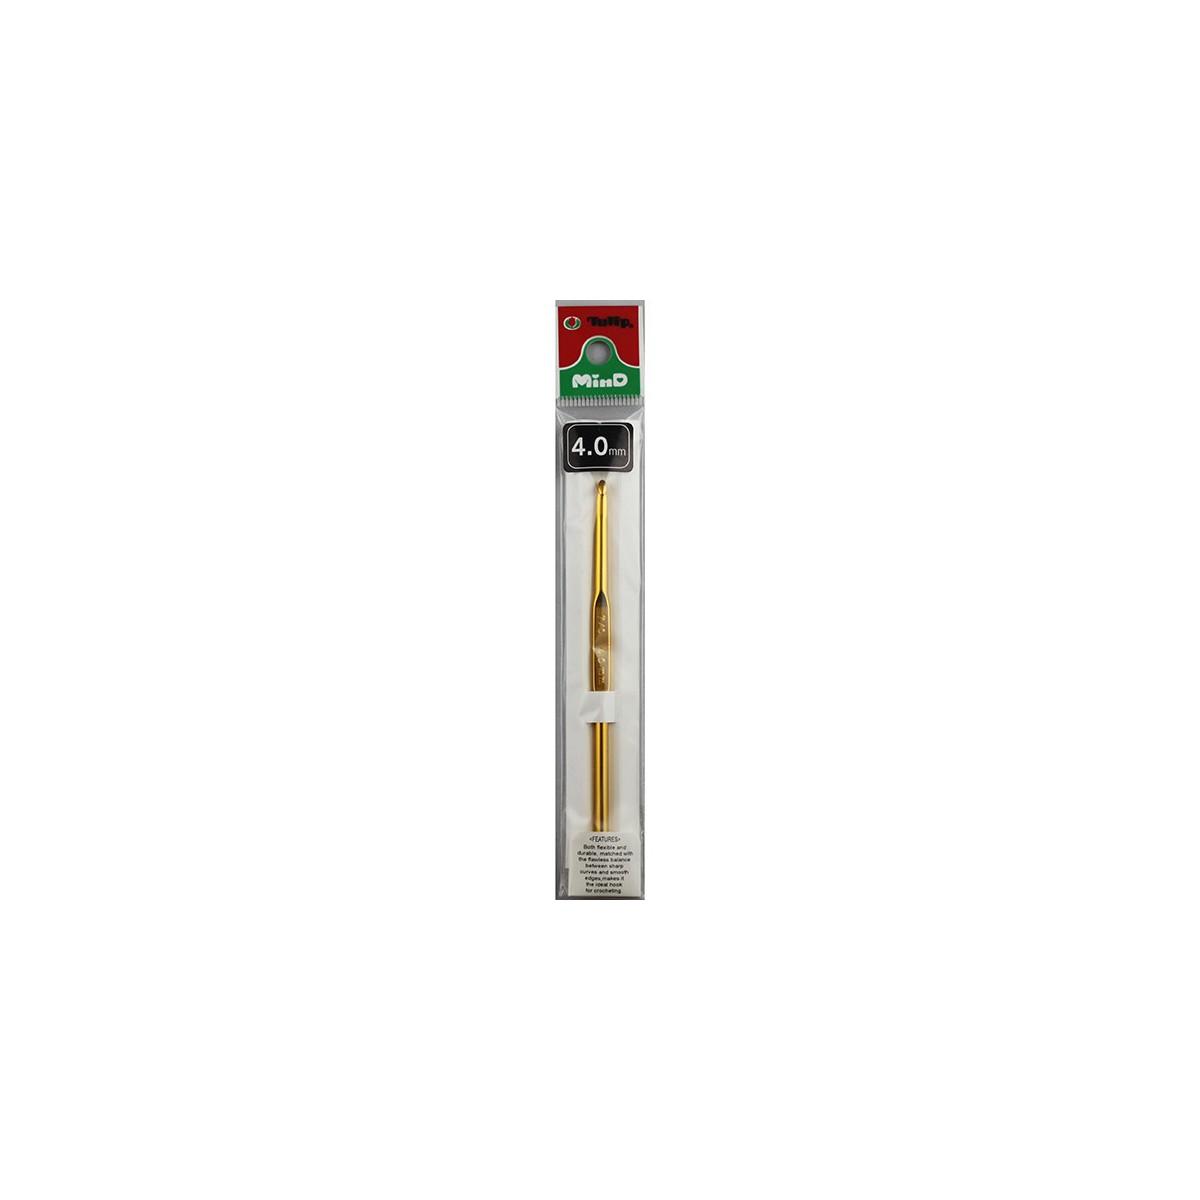 Uncinetto Tulip 4,00mm - 7/0